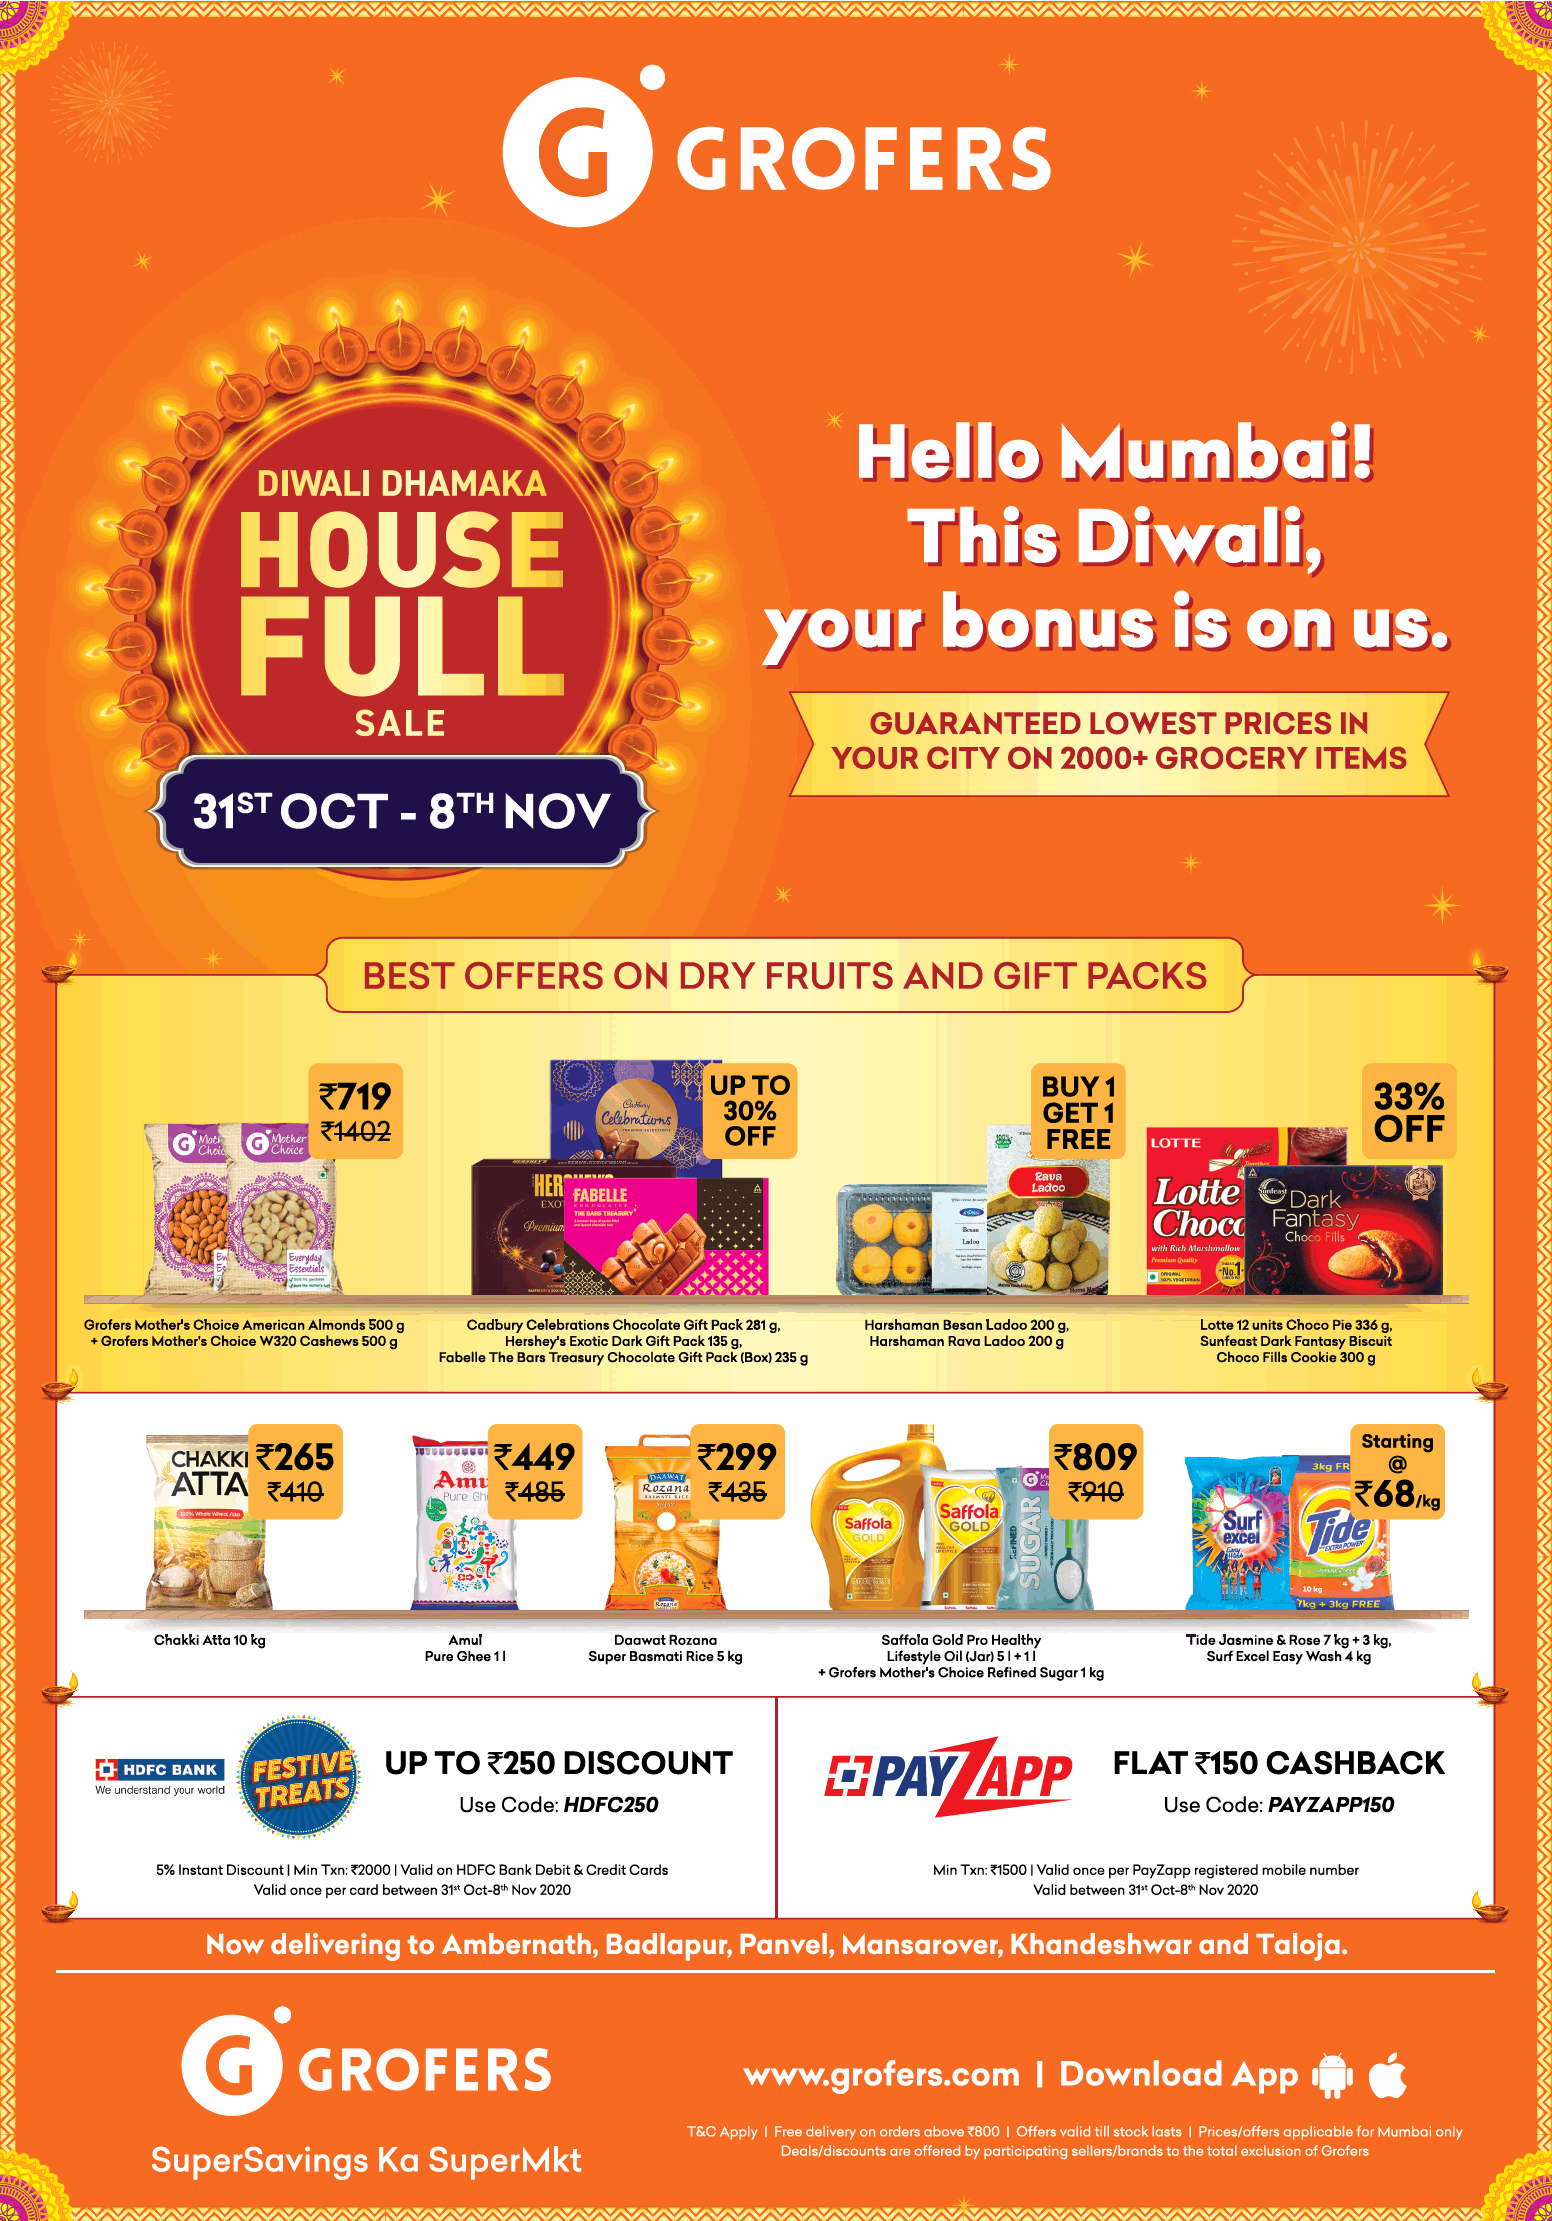 grofers-diwali-dhamaka-house-full-sale-31st-oct-8th-nov-ad-bombay-times-31-10-2020